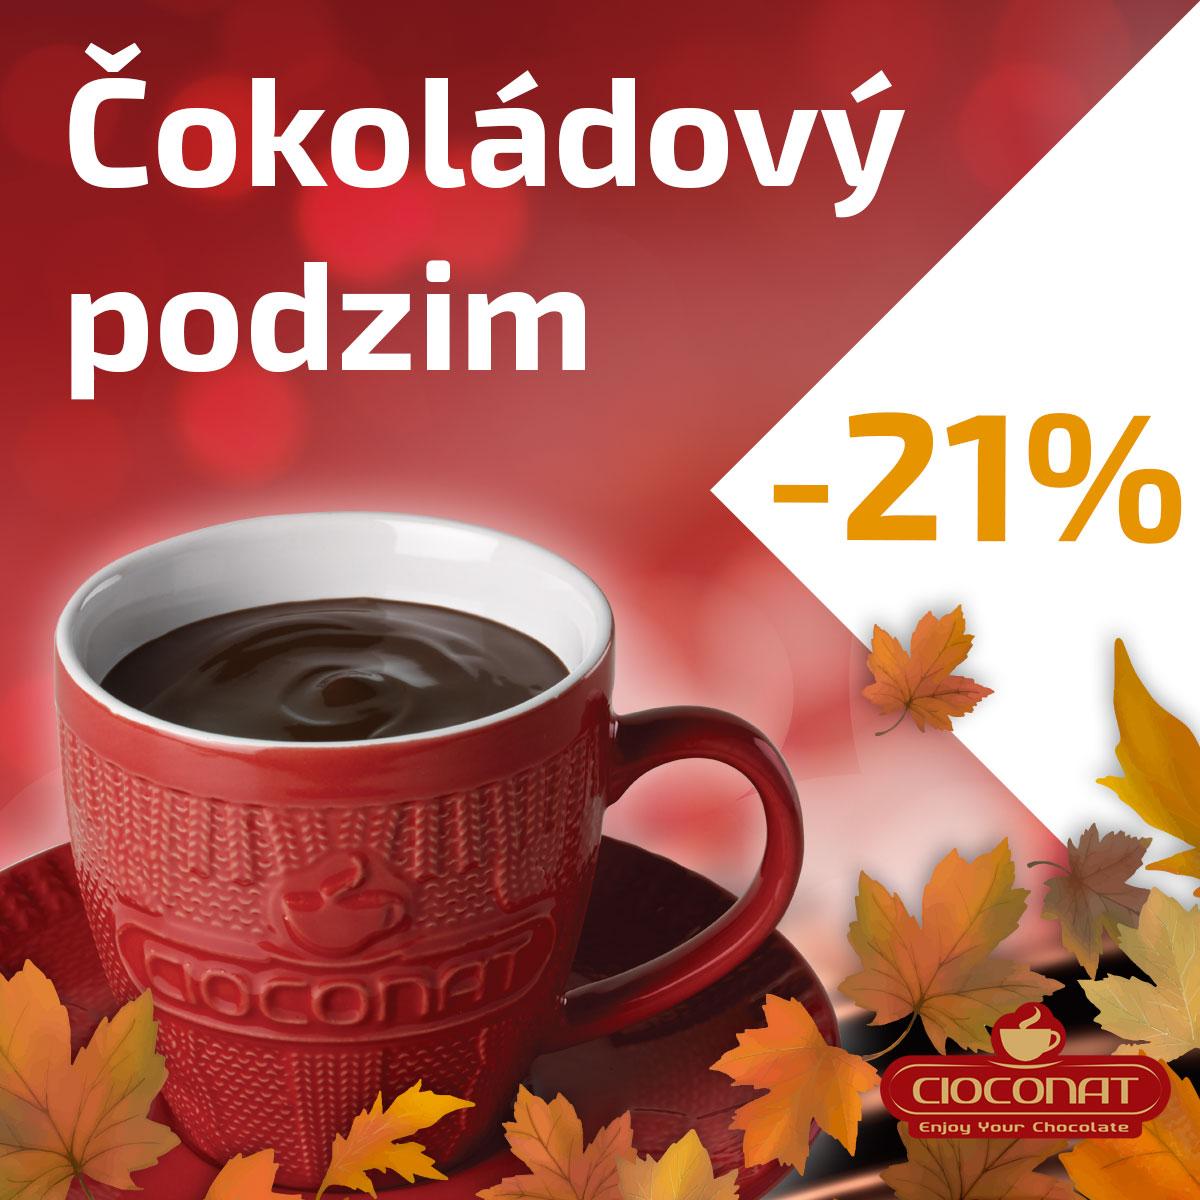 Čokoládový podzim s Cioconat